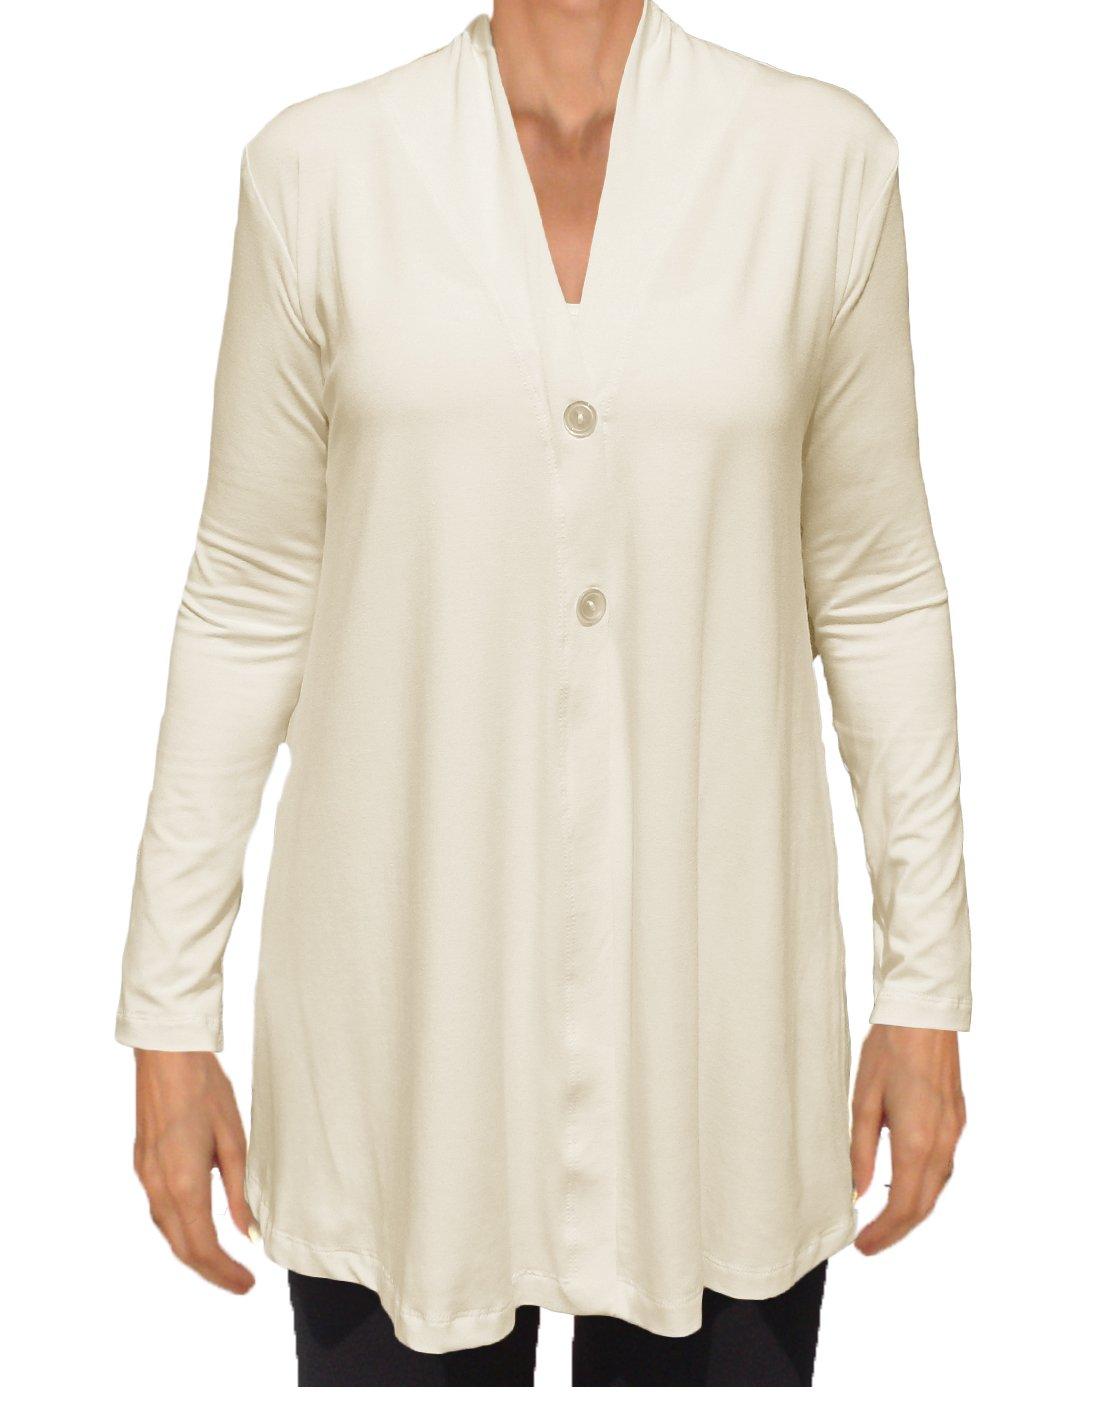 Ooh la la Womens Jersey Knit Flared Lightweight Draping Cardigan Sweater Jacket (X-Large 38-39, Ivory)